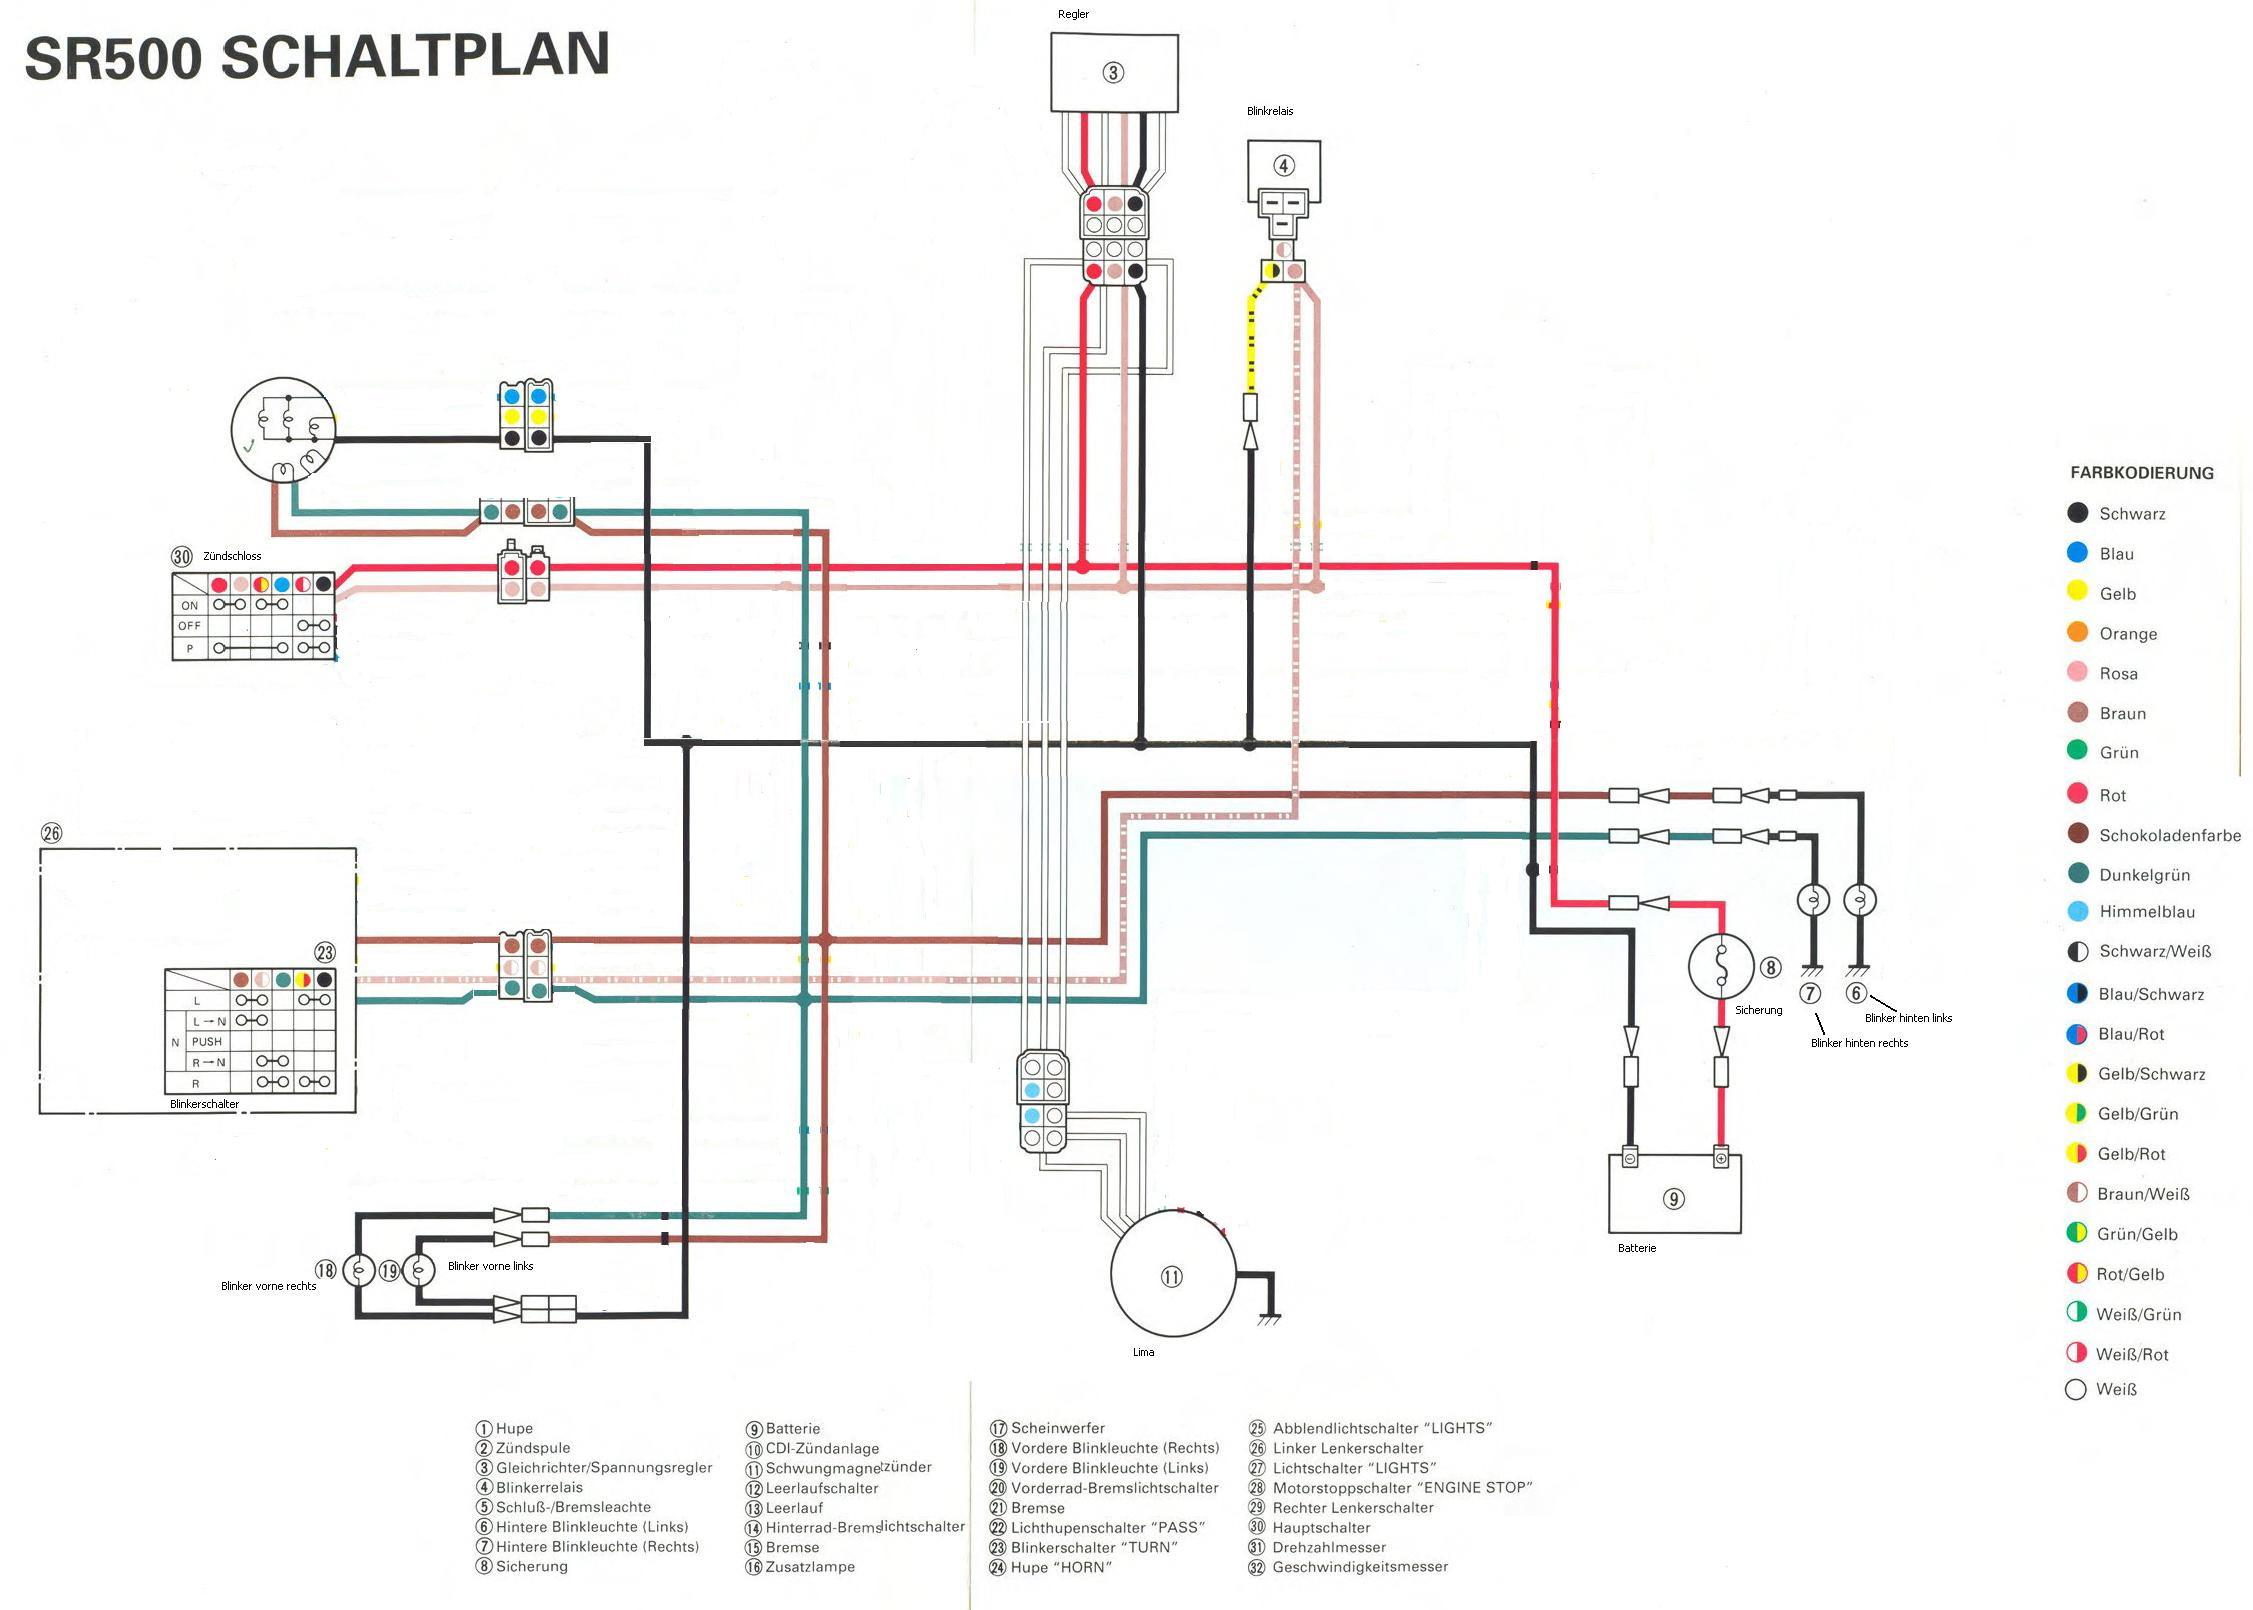 Fein Furt Blinker Schaltplan Ideen - Elektrische Schaltplan-Ideen ...